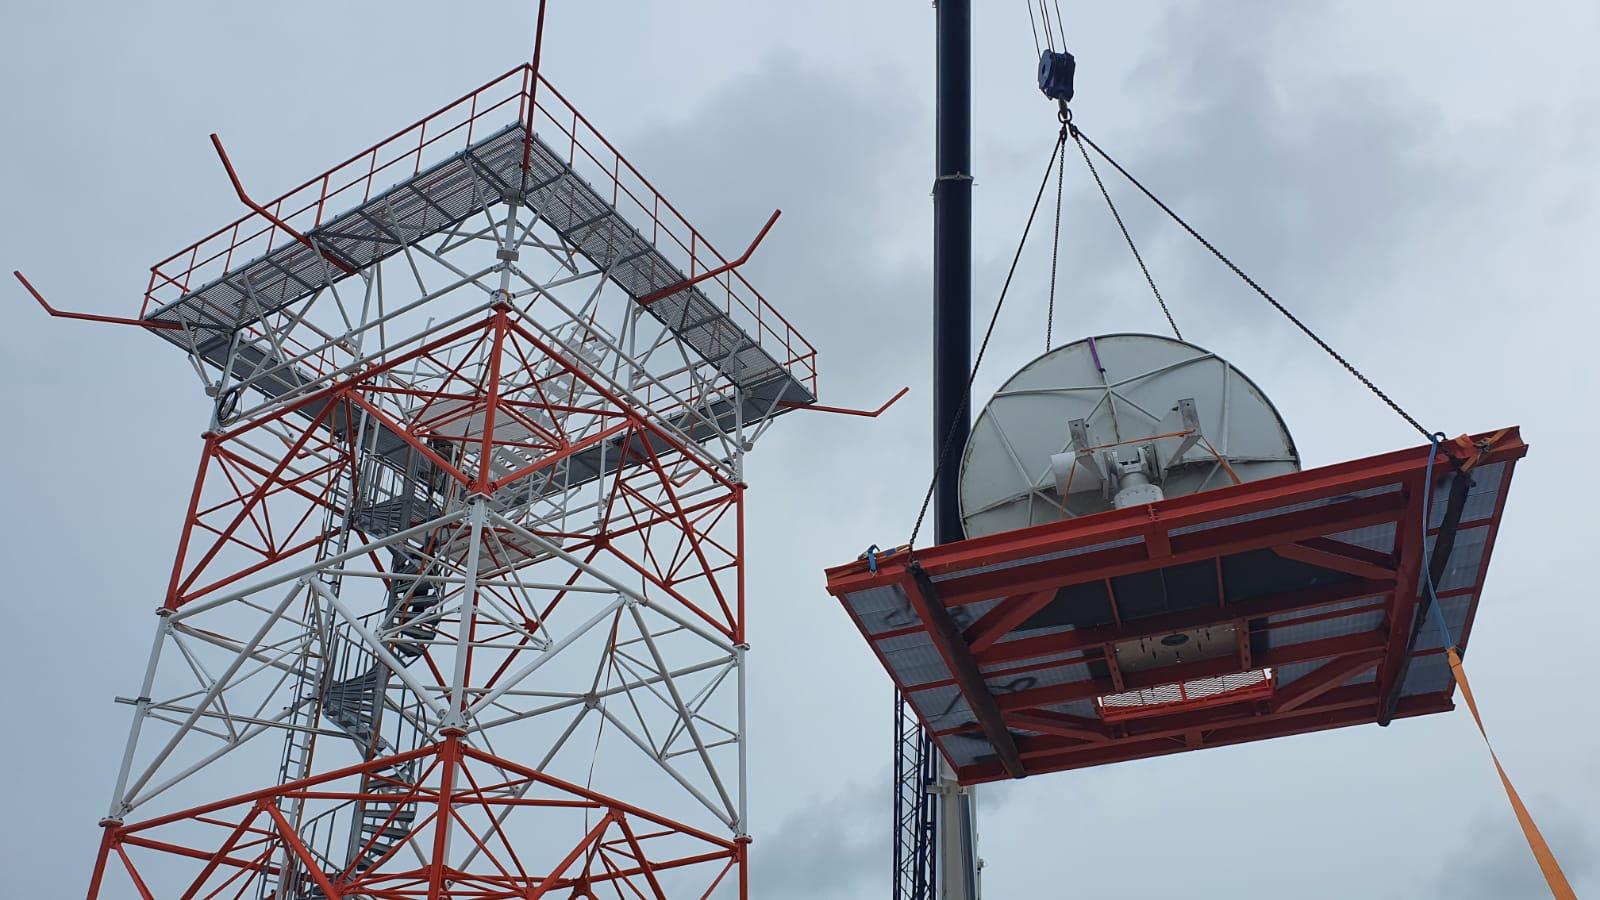 ragged island weather radar station construction